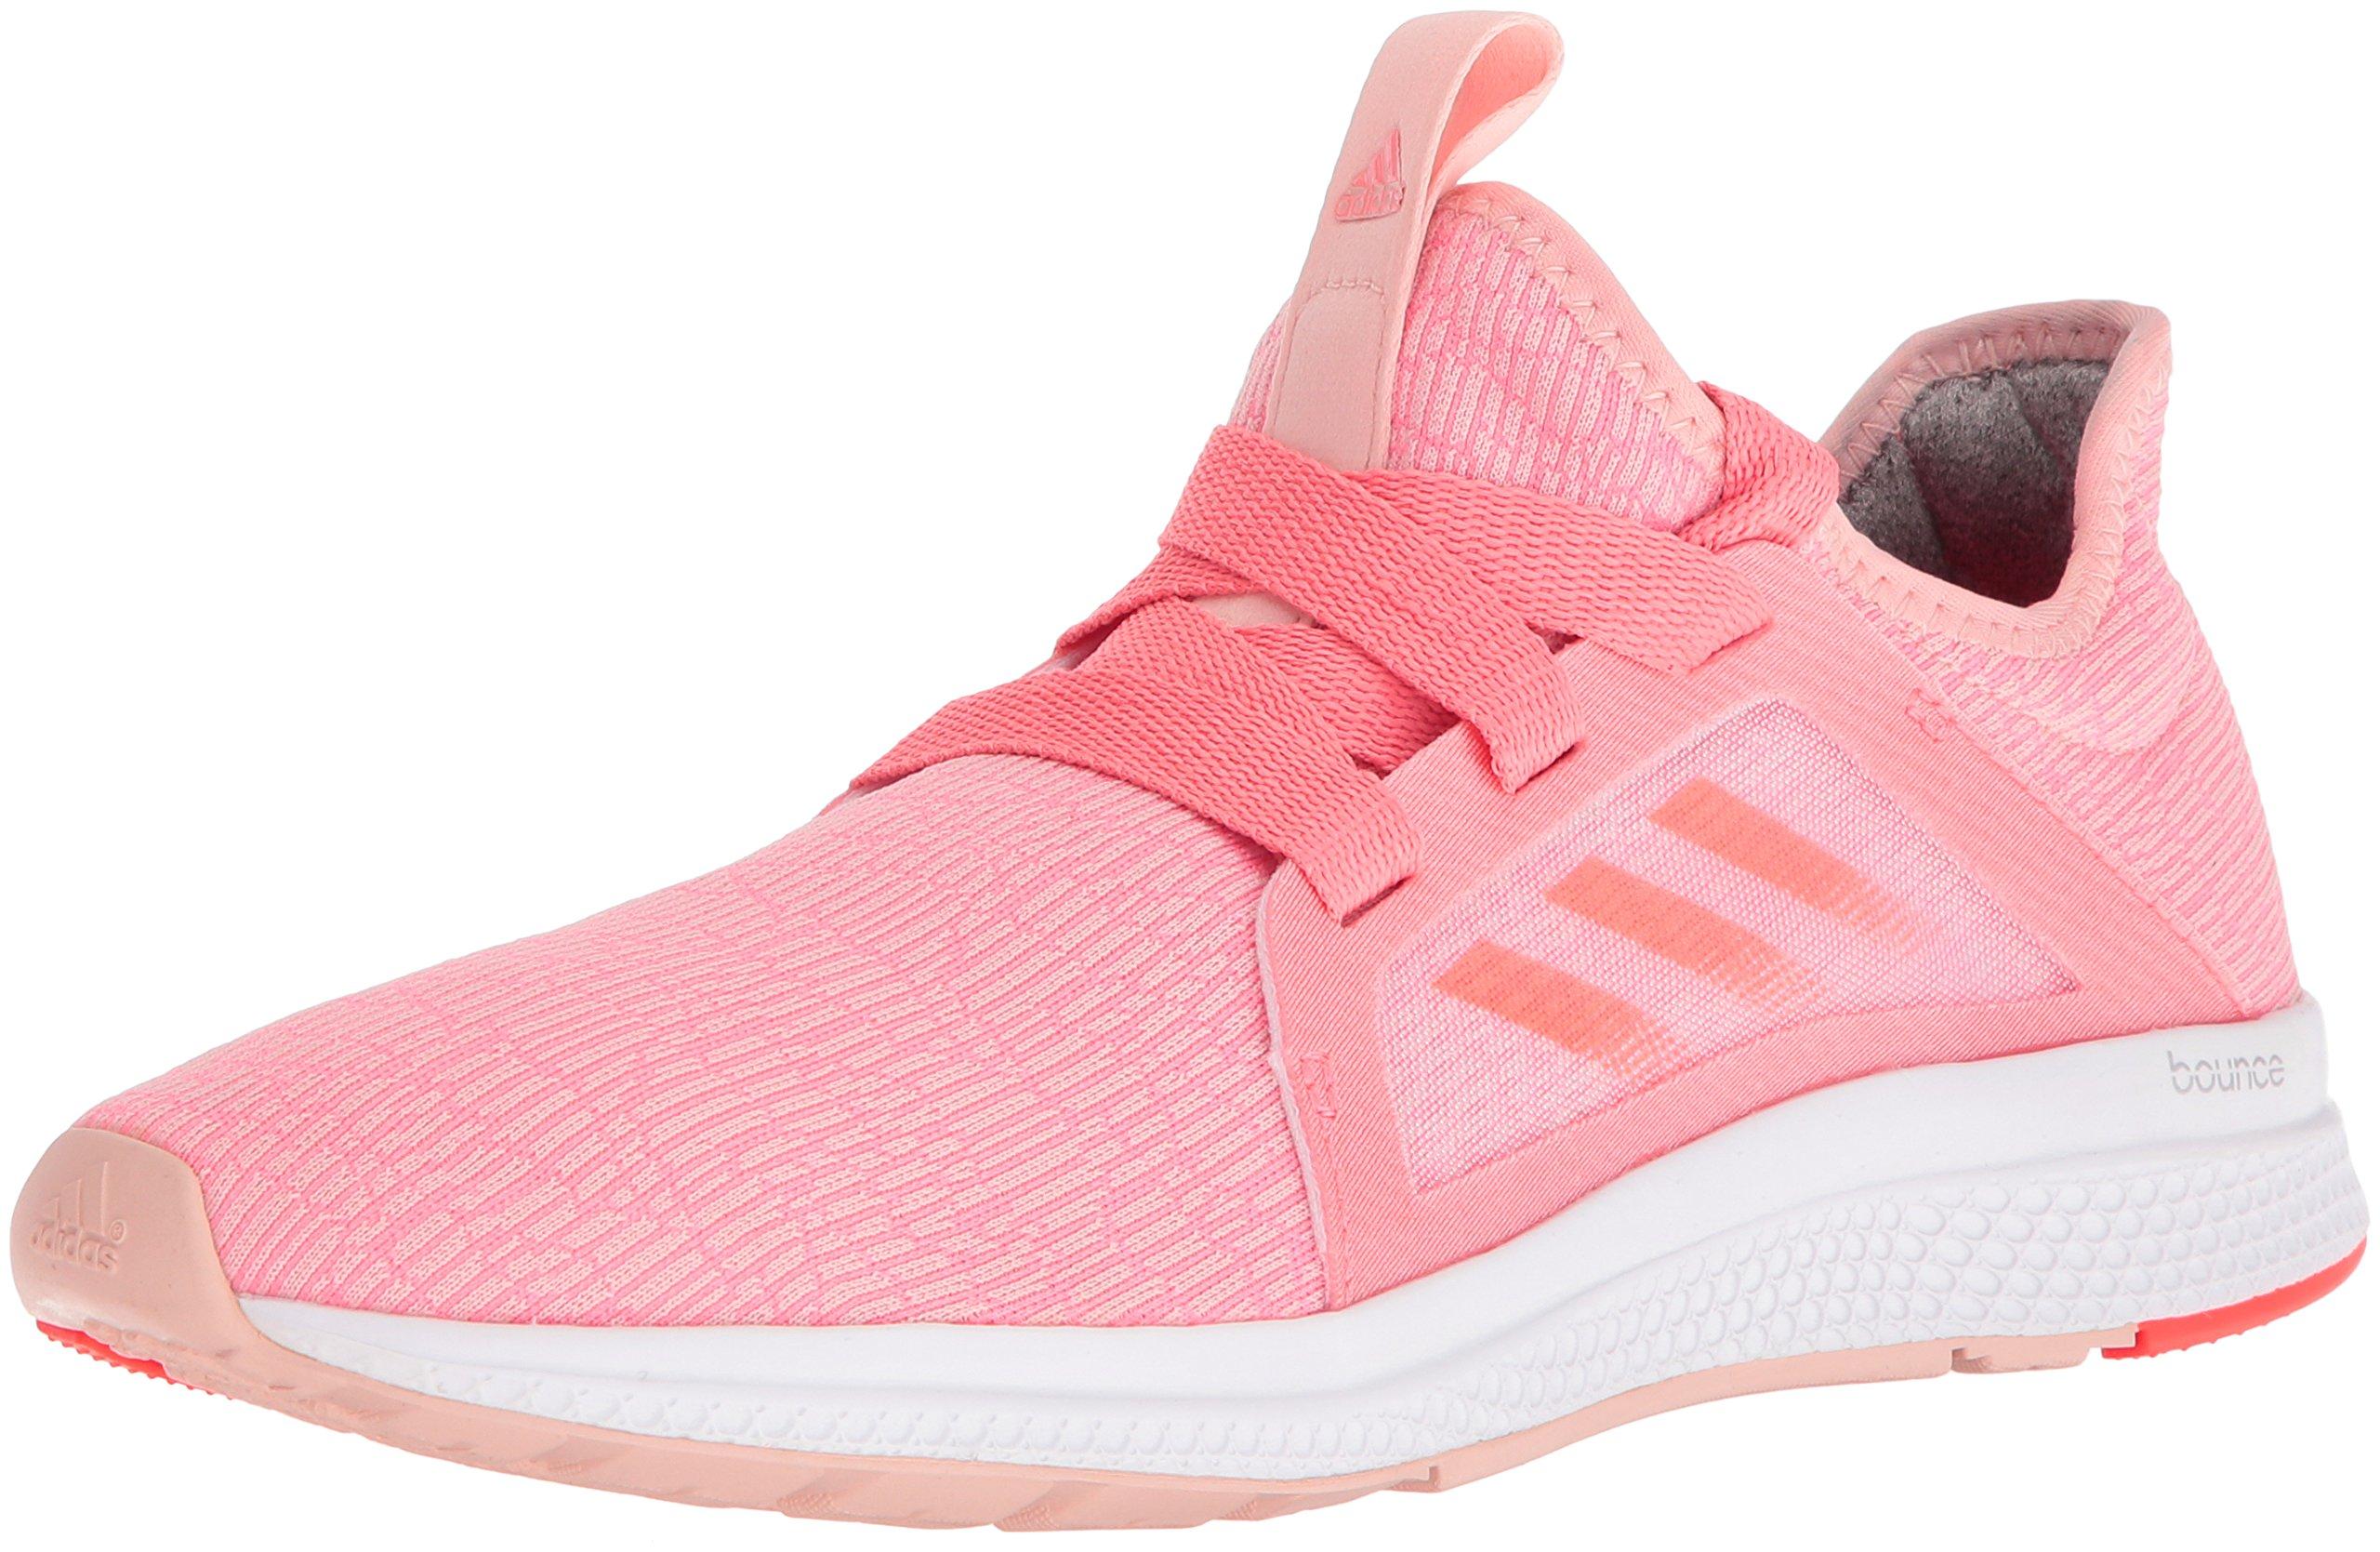 620c12668d0ce Galleon - Adidas Women s Edge Lux W Running Shoe